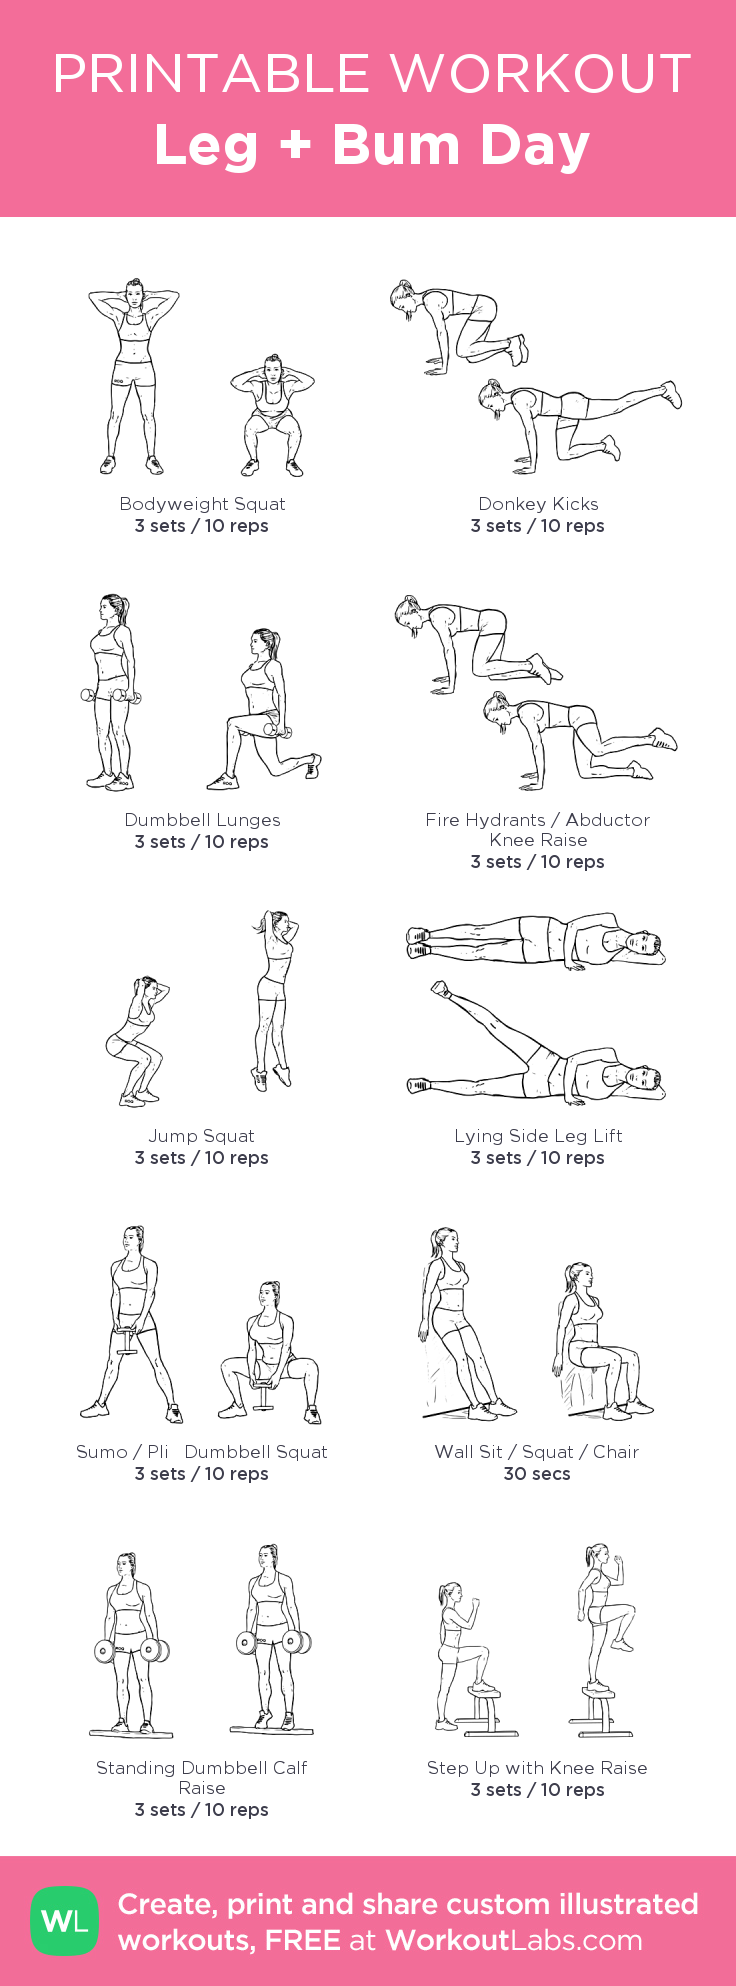 zsírégető súly rutinok